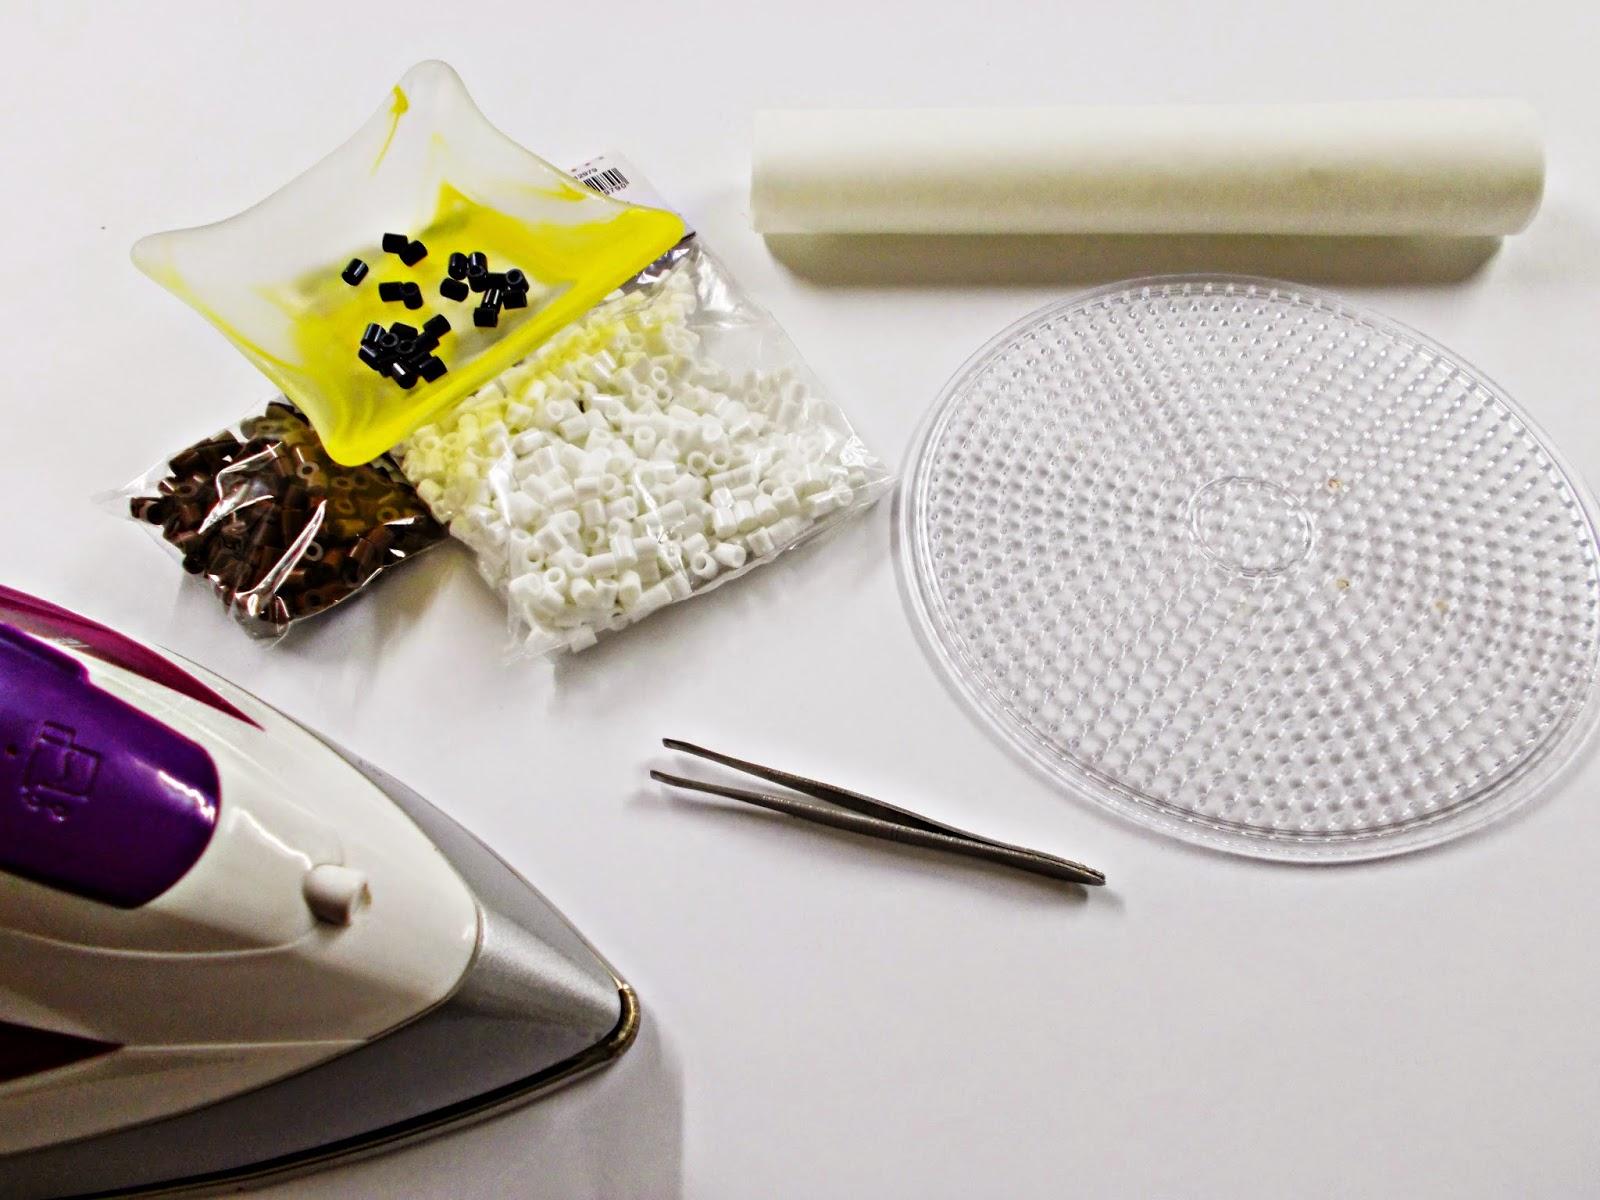 DIY-Hama Beads-ideas-galleta-cookie-guarda auriculares-cables-organizador-2